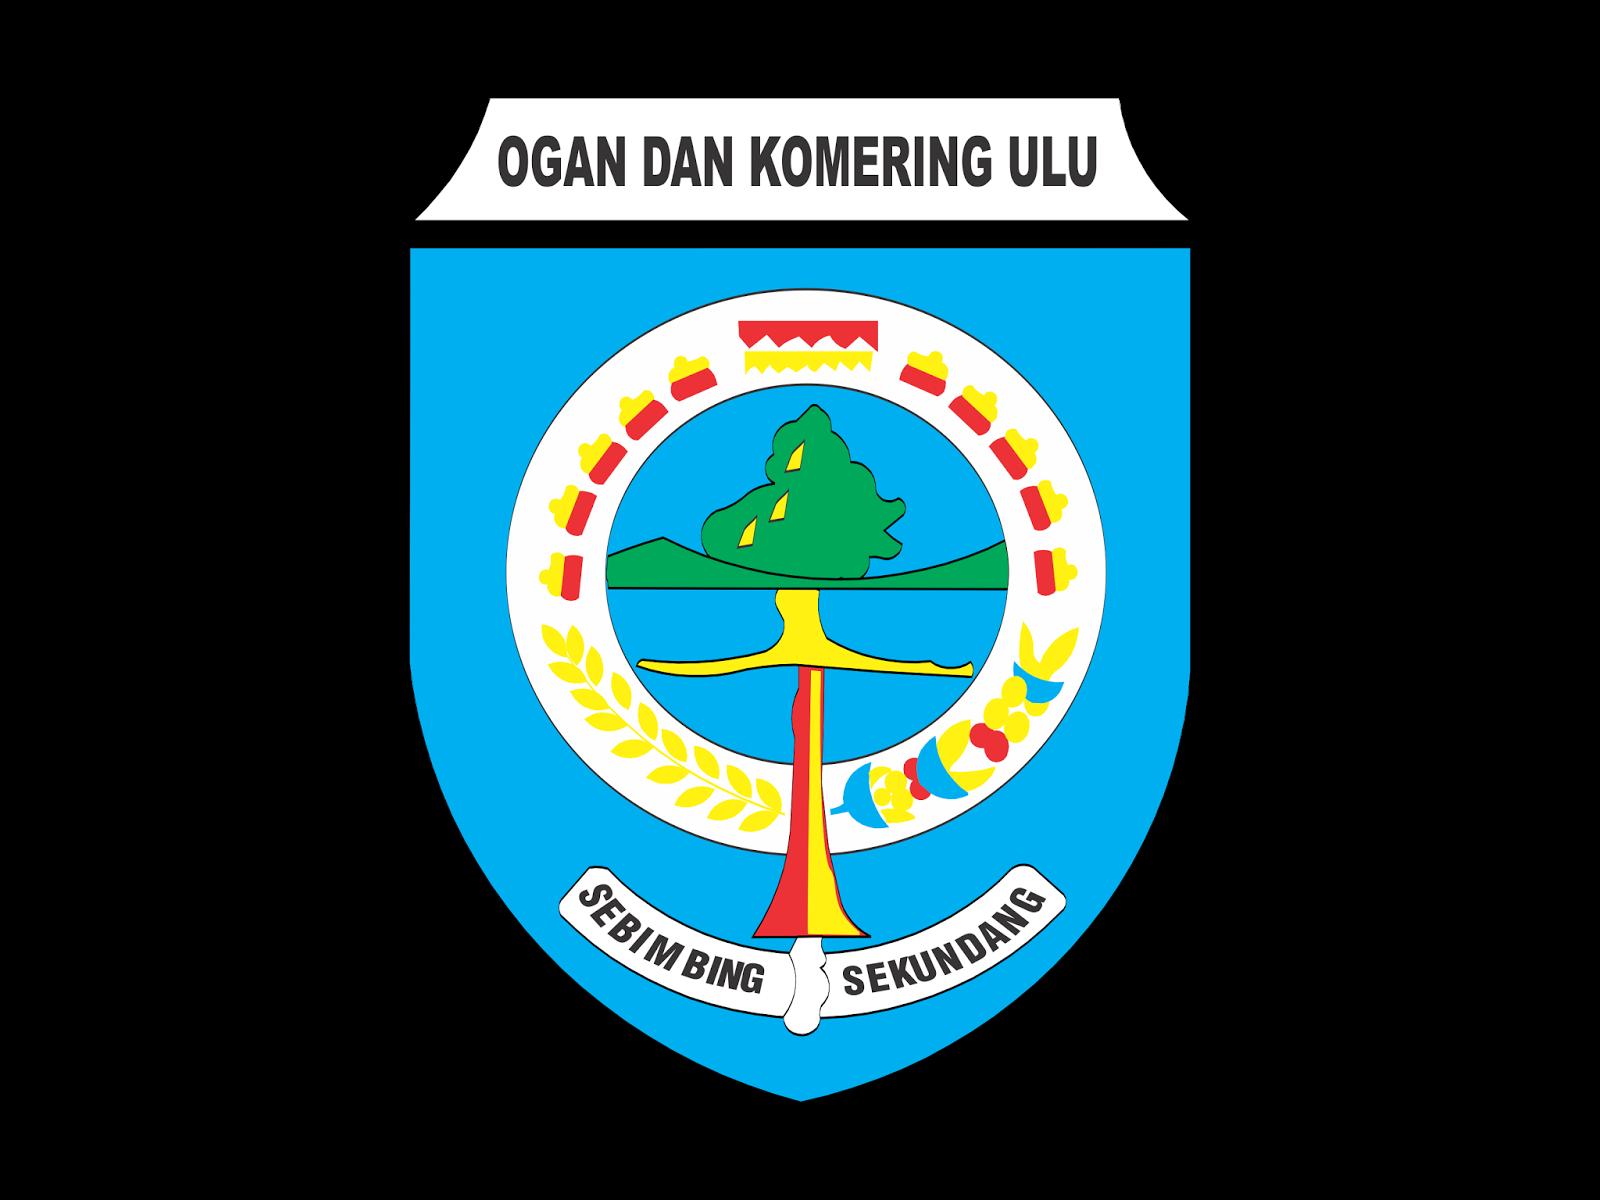 Warung Vector Logo Kabupaten Ogan Komering Ulu Vector Cdr Png Hd